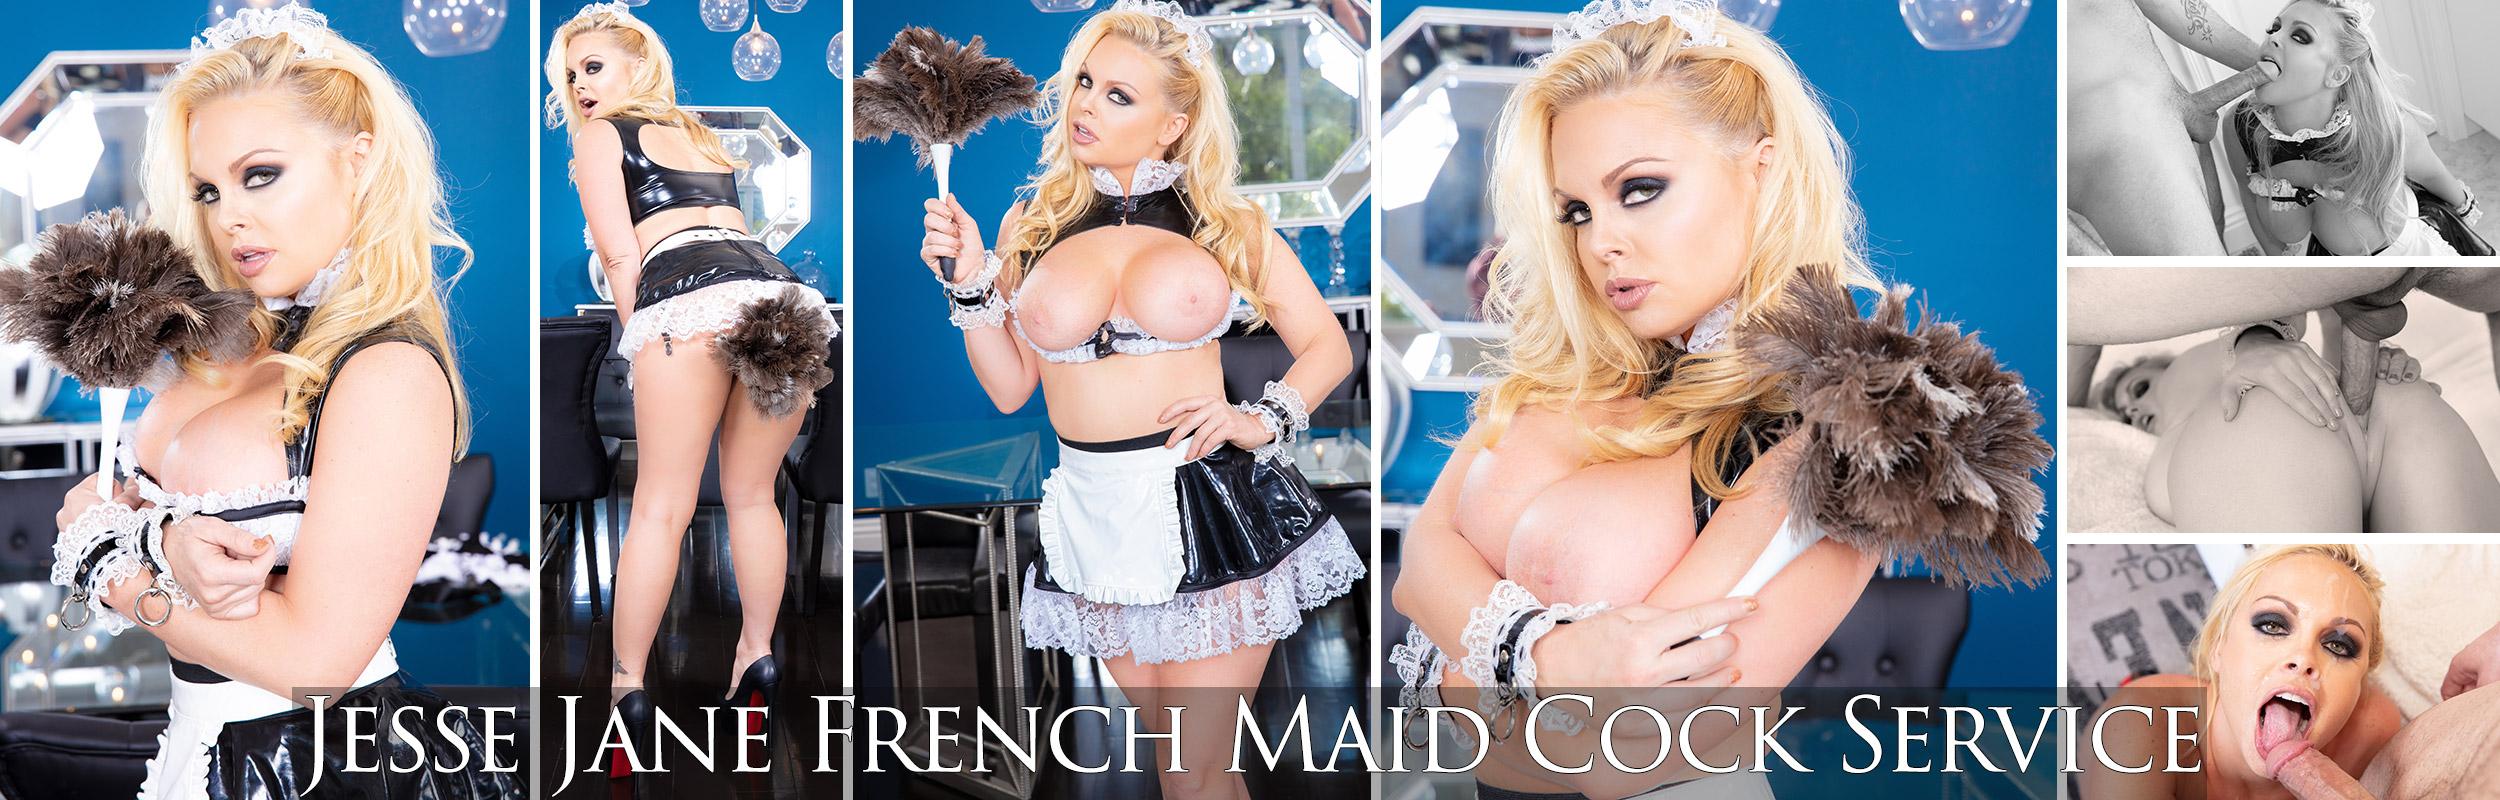 Jesse Jane: French Maid Cock Service